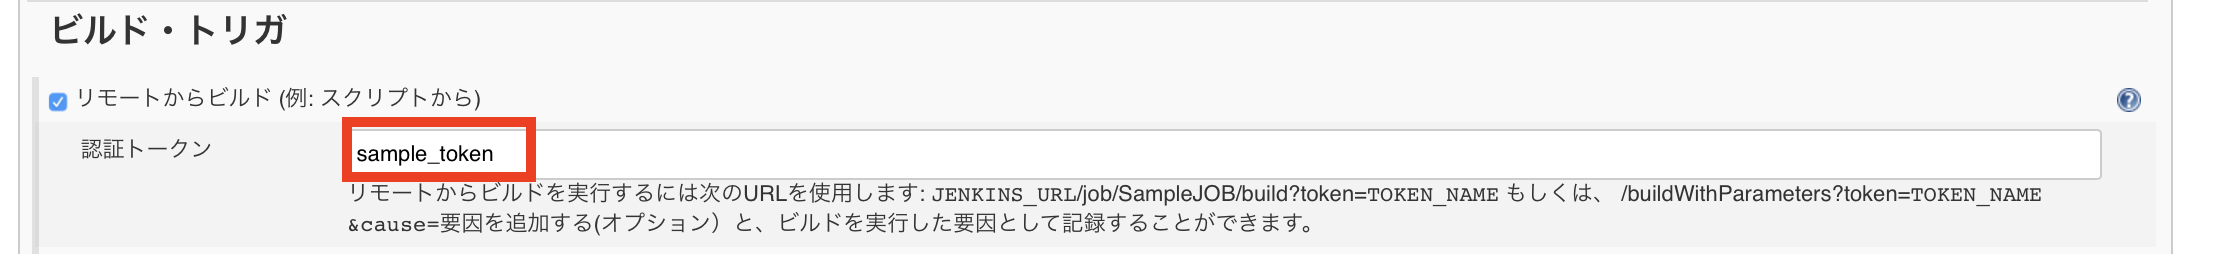 Jenkins3-9